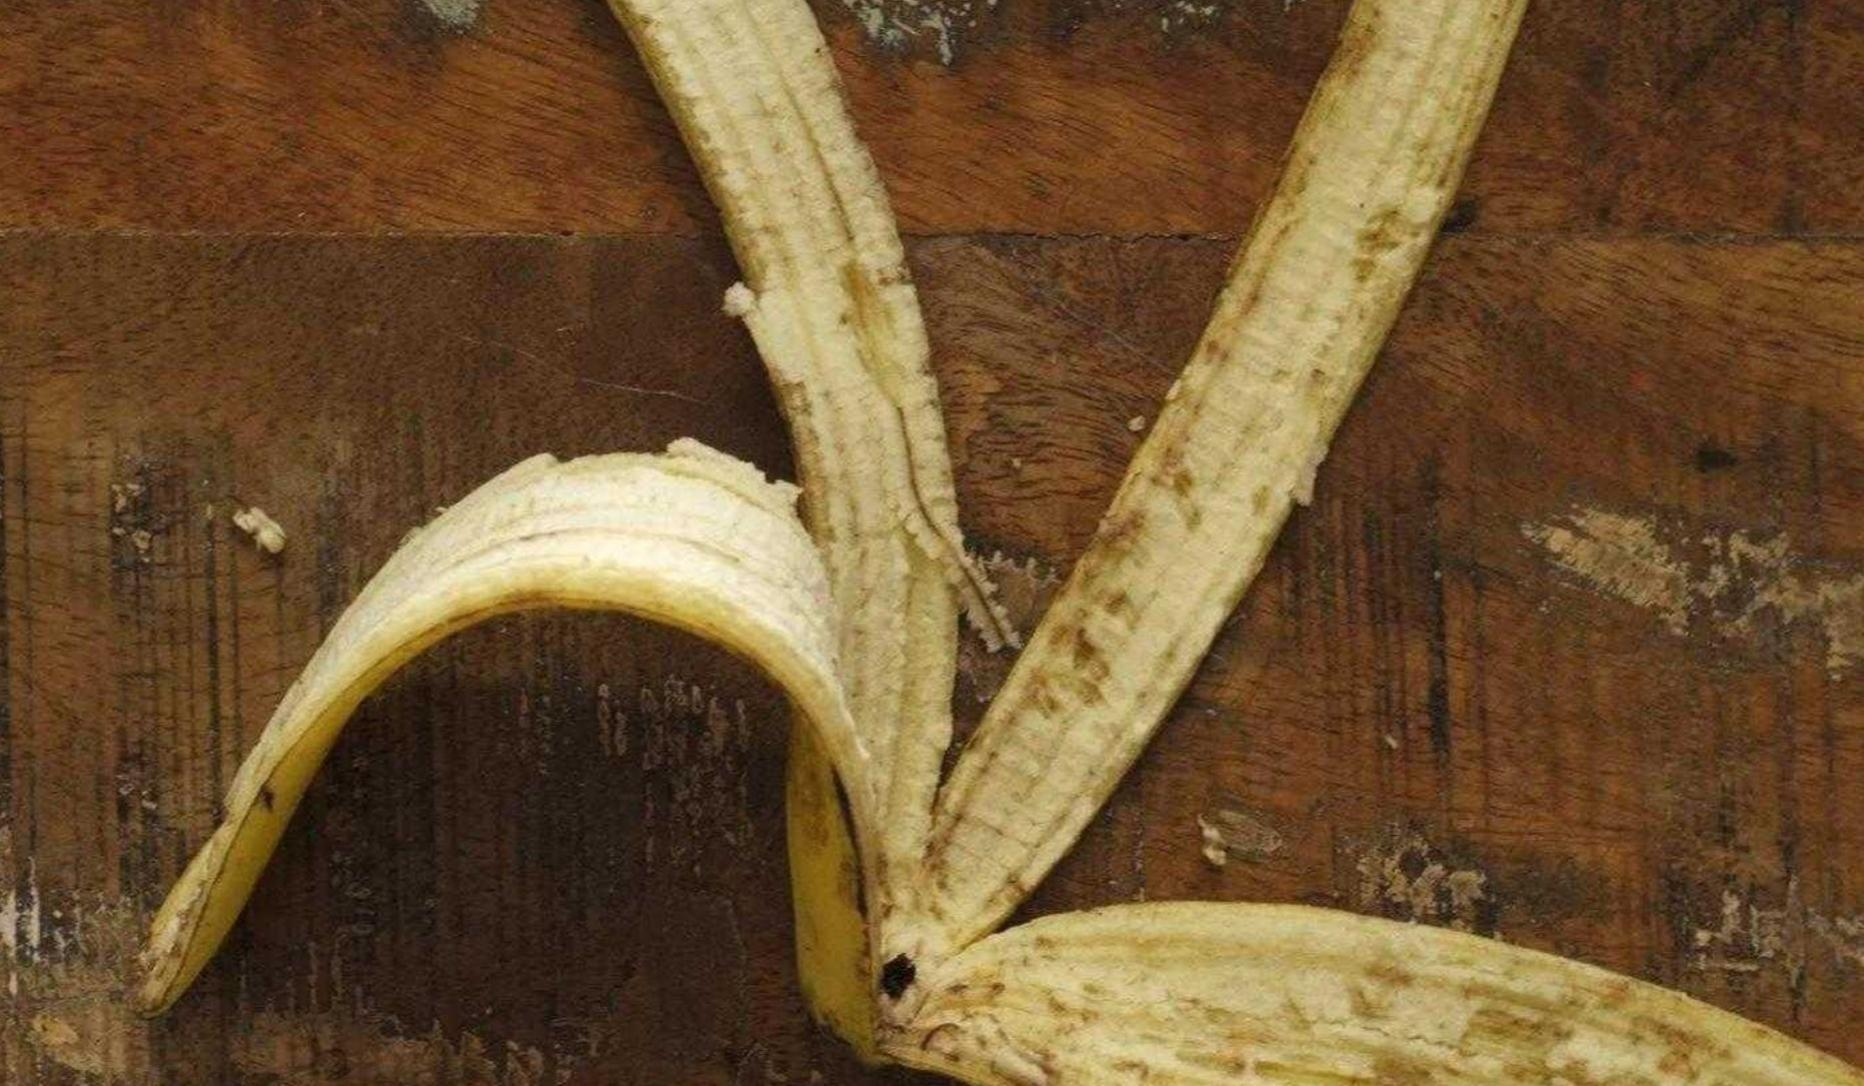 Banana Peel © Ivo Schneider